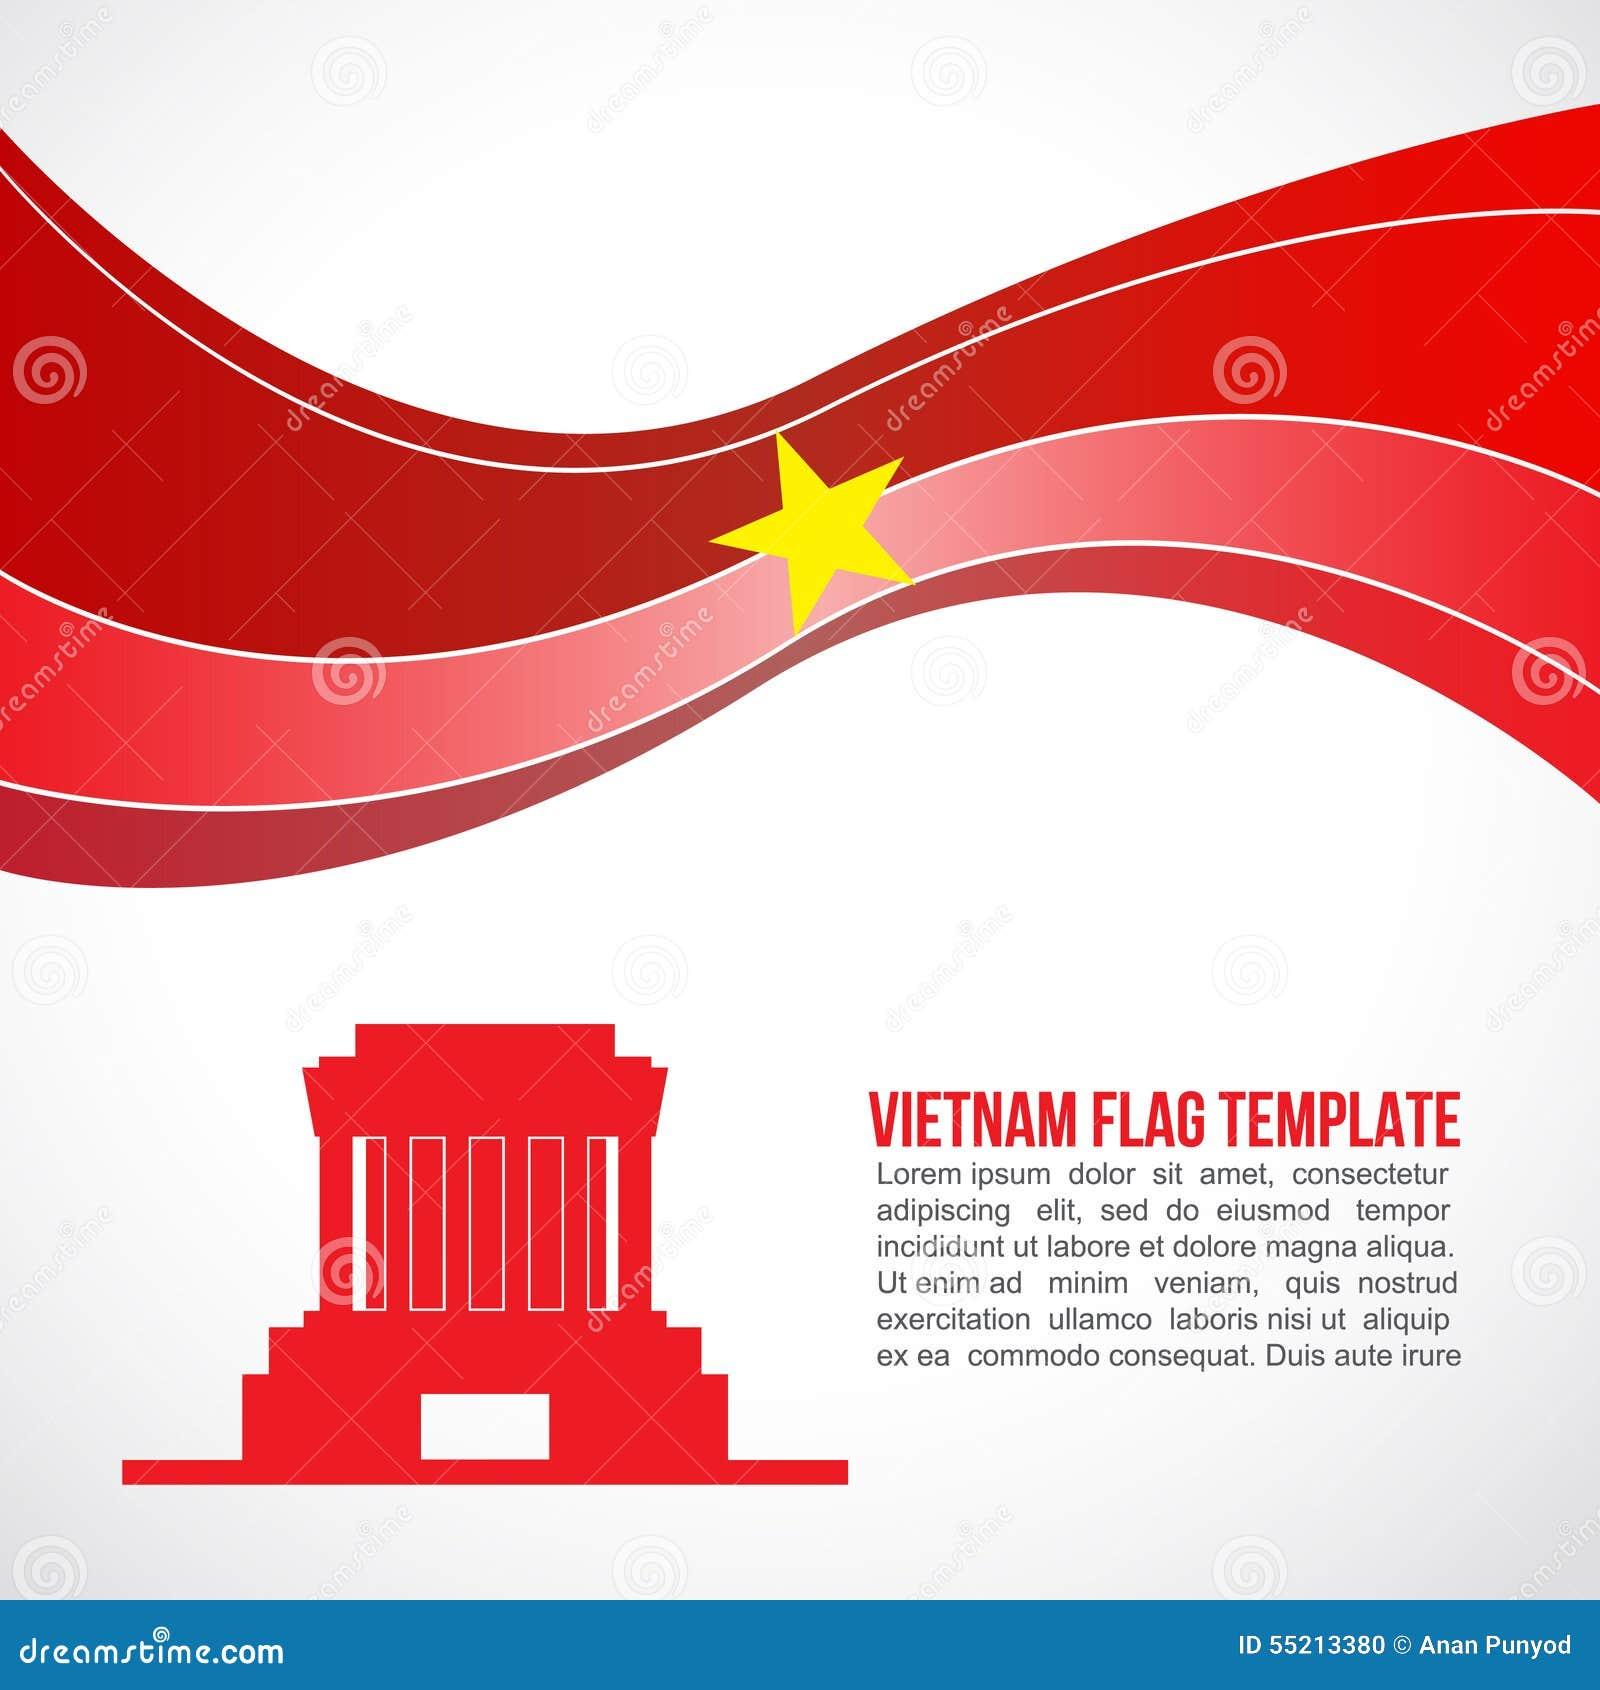 Abstract de vlaggolf en Ho Chi Minh van Vietnam - Mausoleum Hanoi